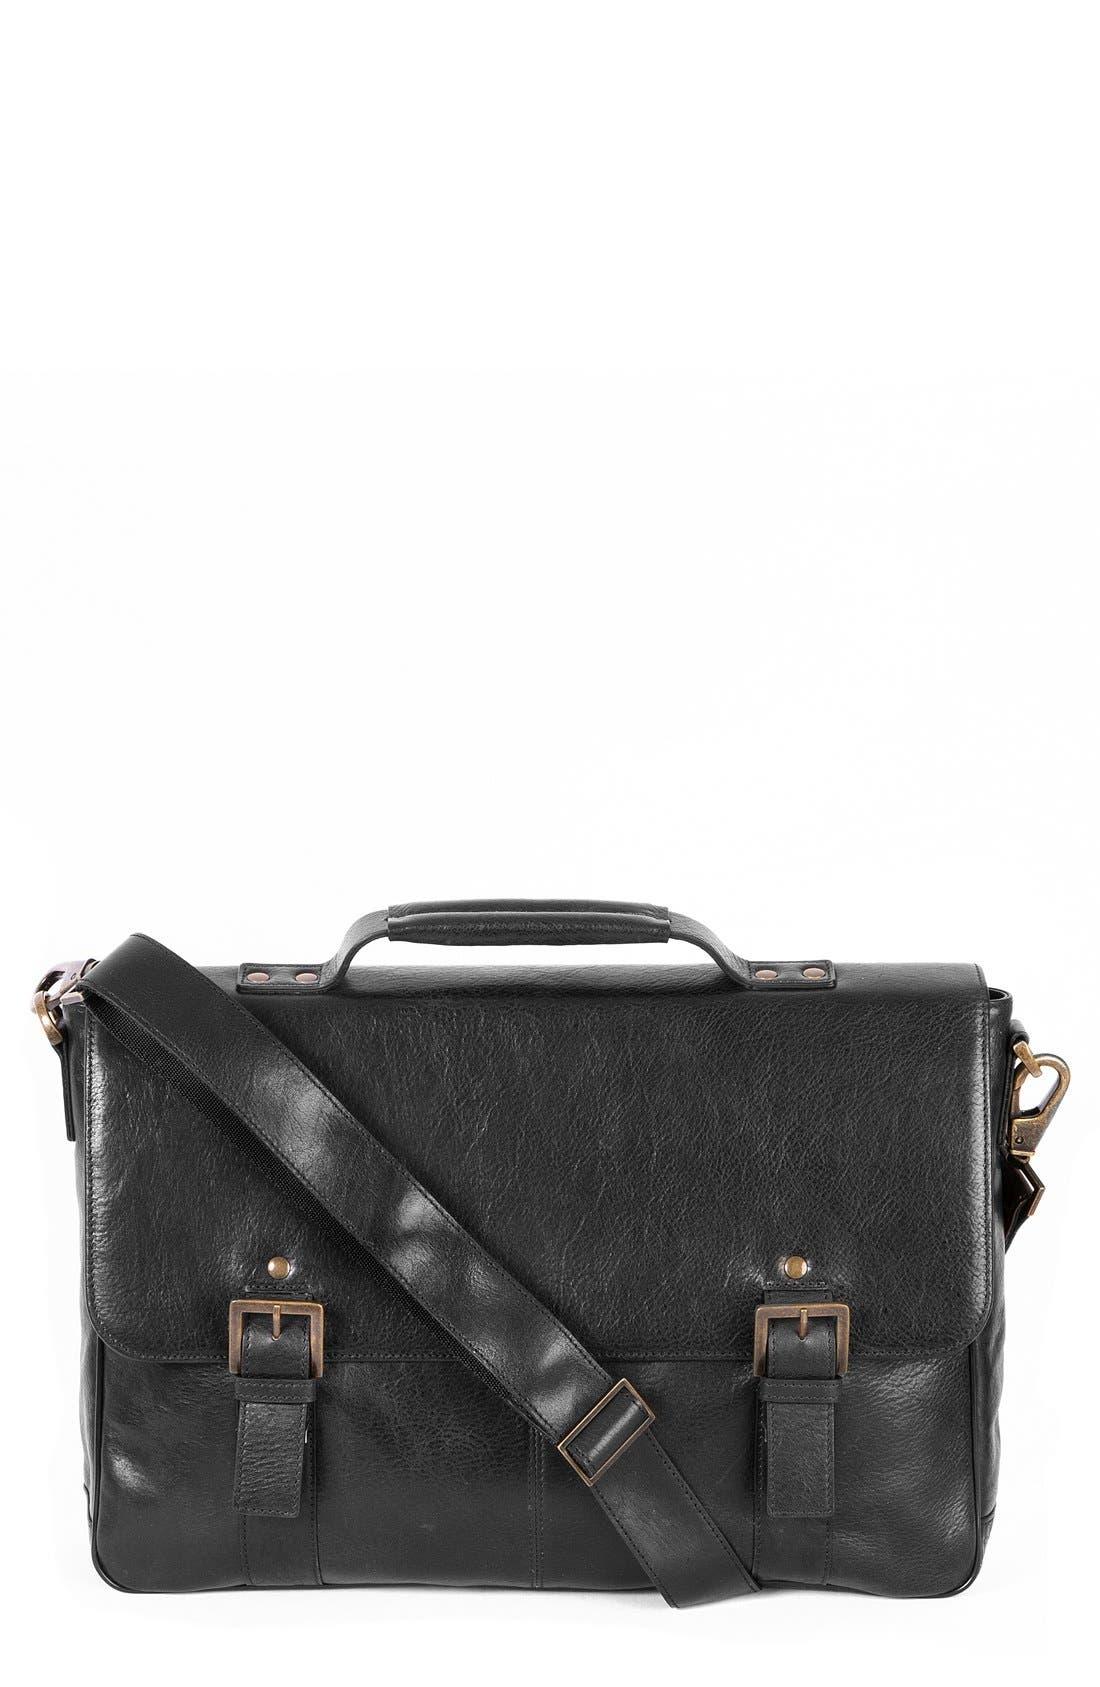 'Becker' Leather Messenger Bag,                         Main,                         color, BLACK W/ KHAKI